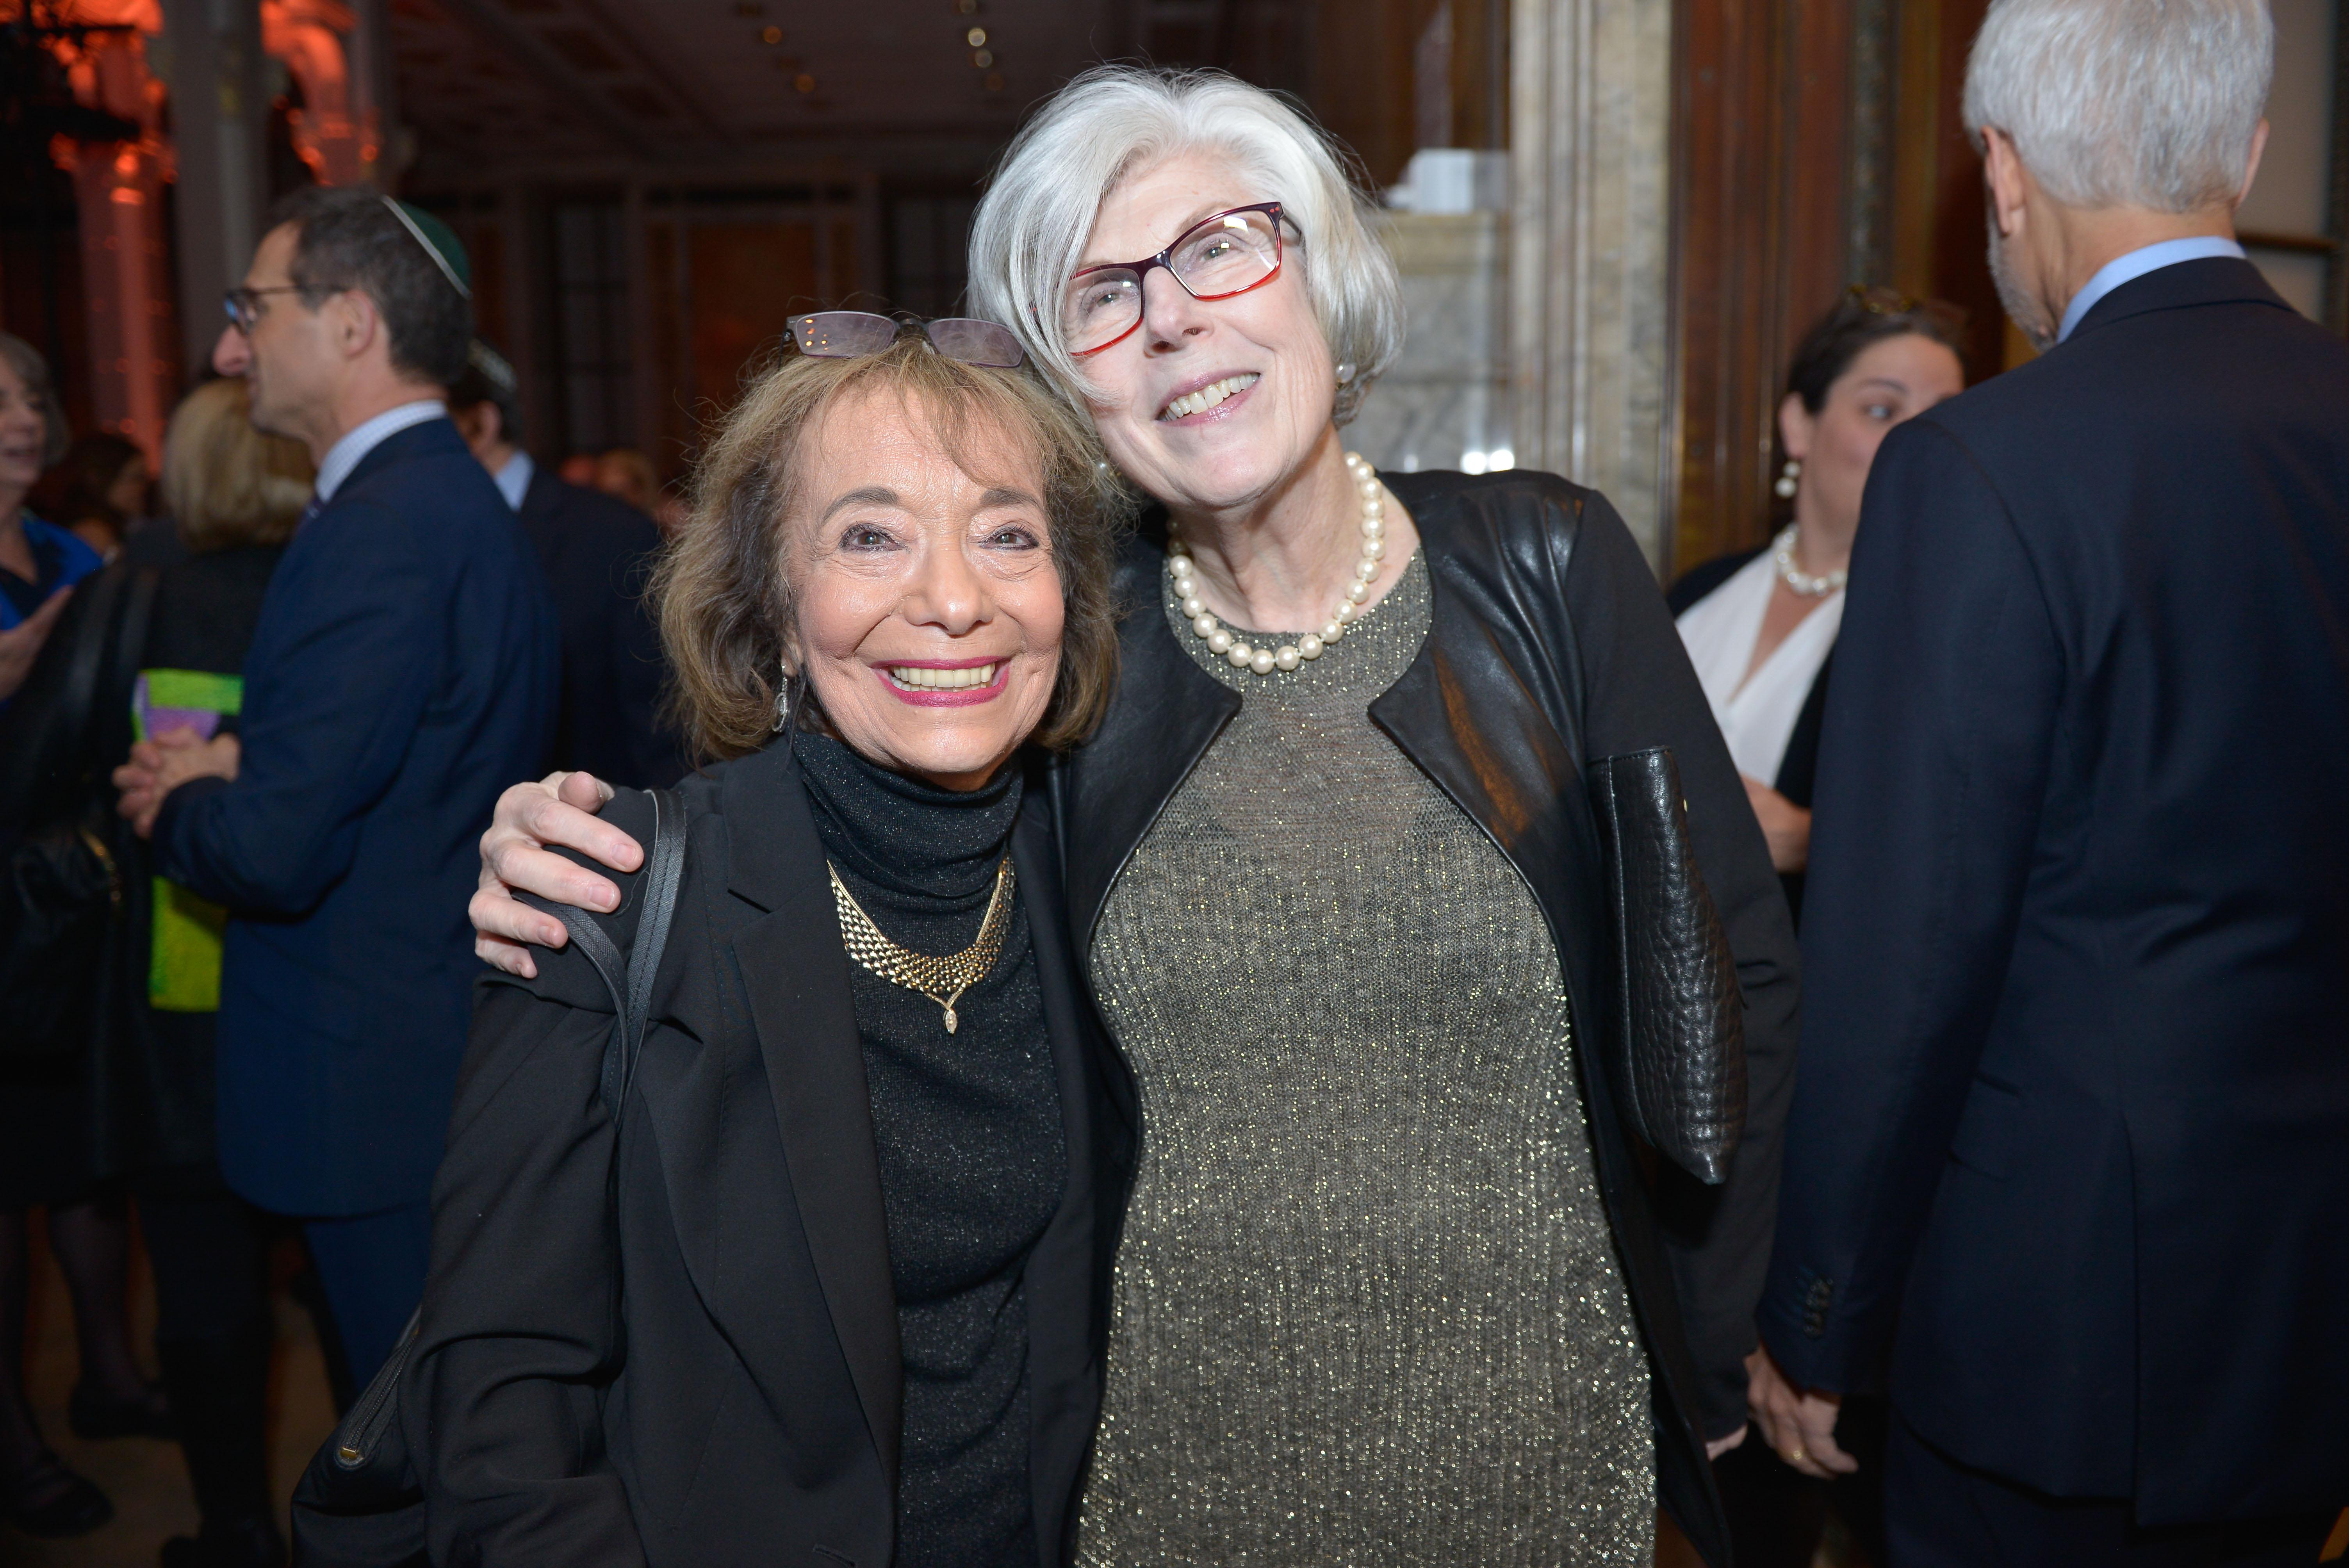 From left: Carolyn Starman Hessel and Carol Oseran Starin.